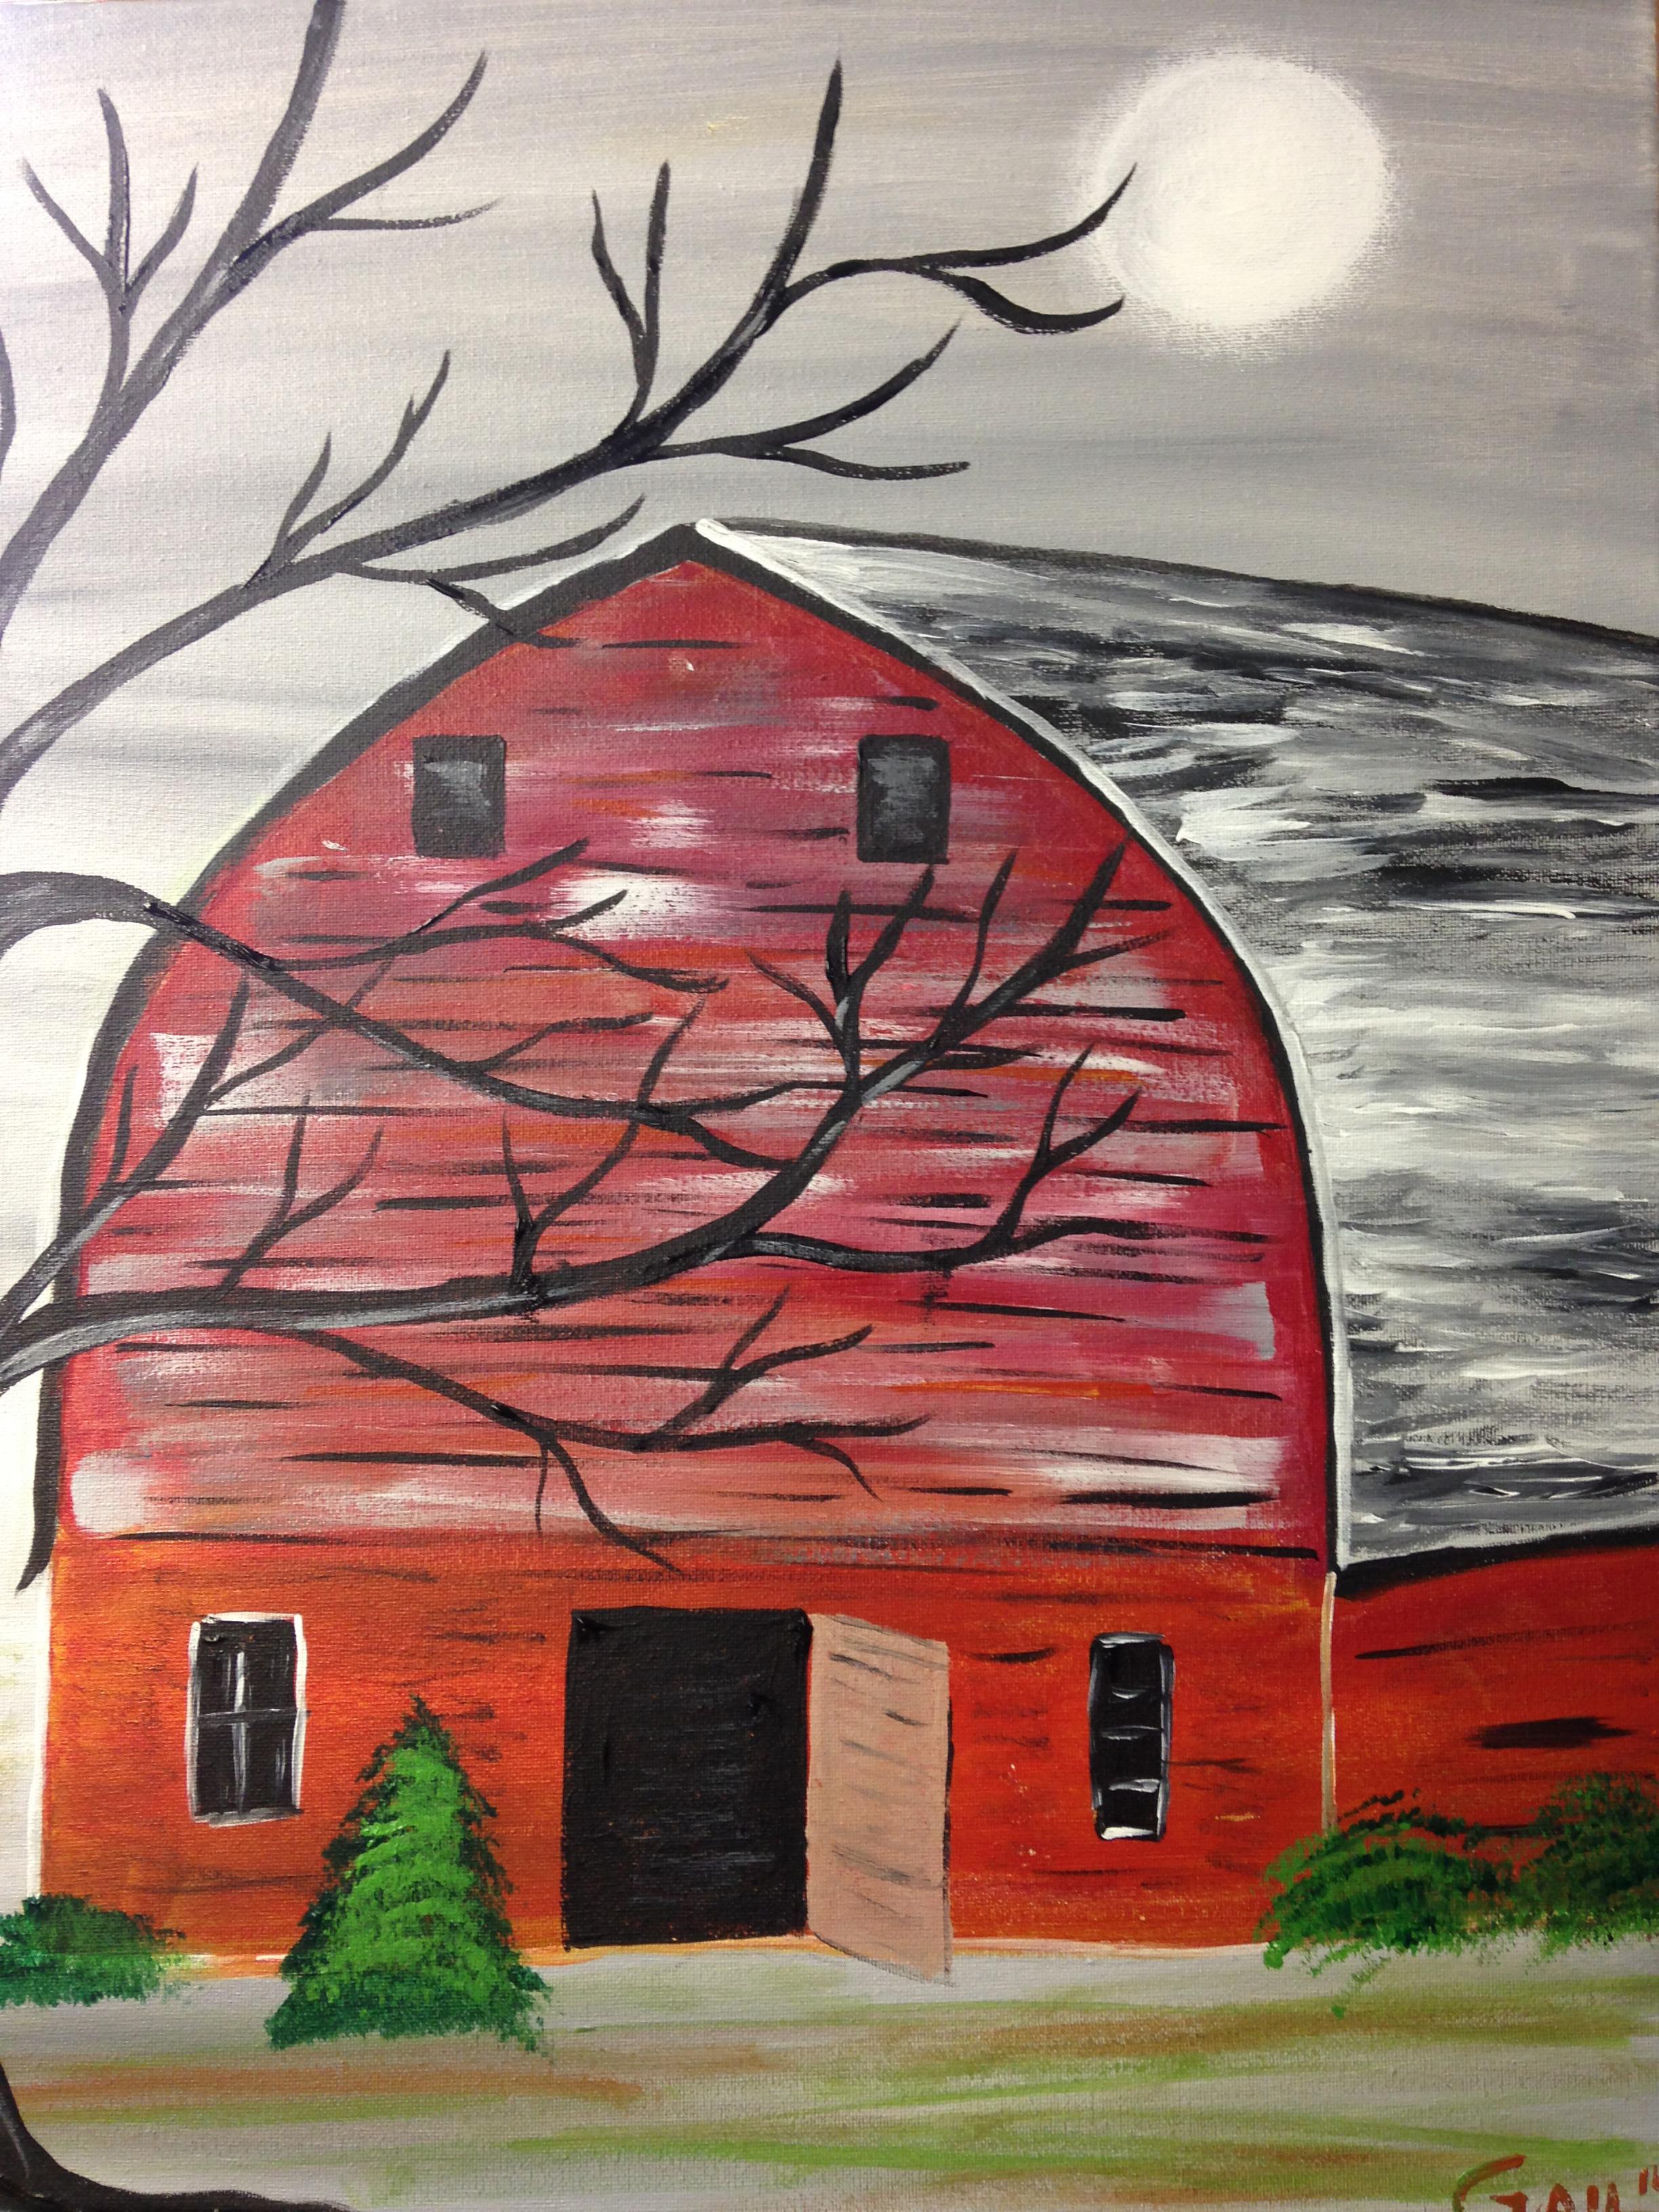 Joyful H Arts Studio Paint N Sip Wine Classes Parties